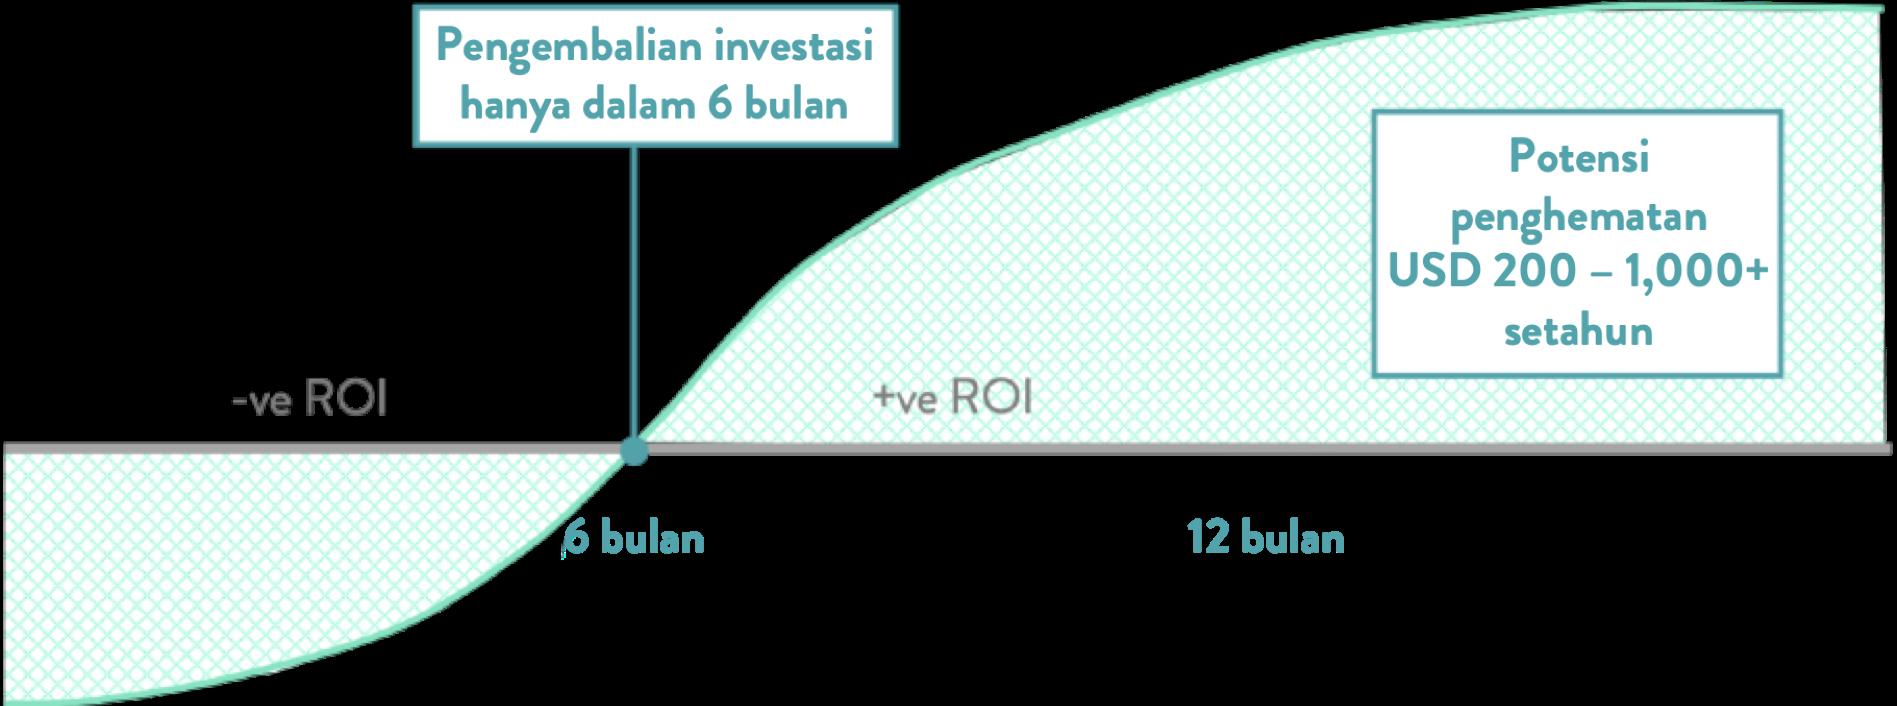 [indonesian]